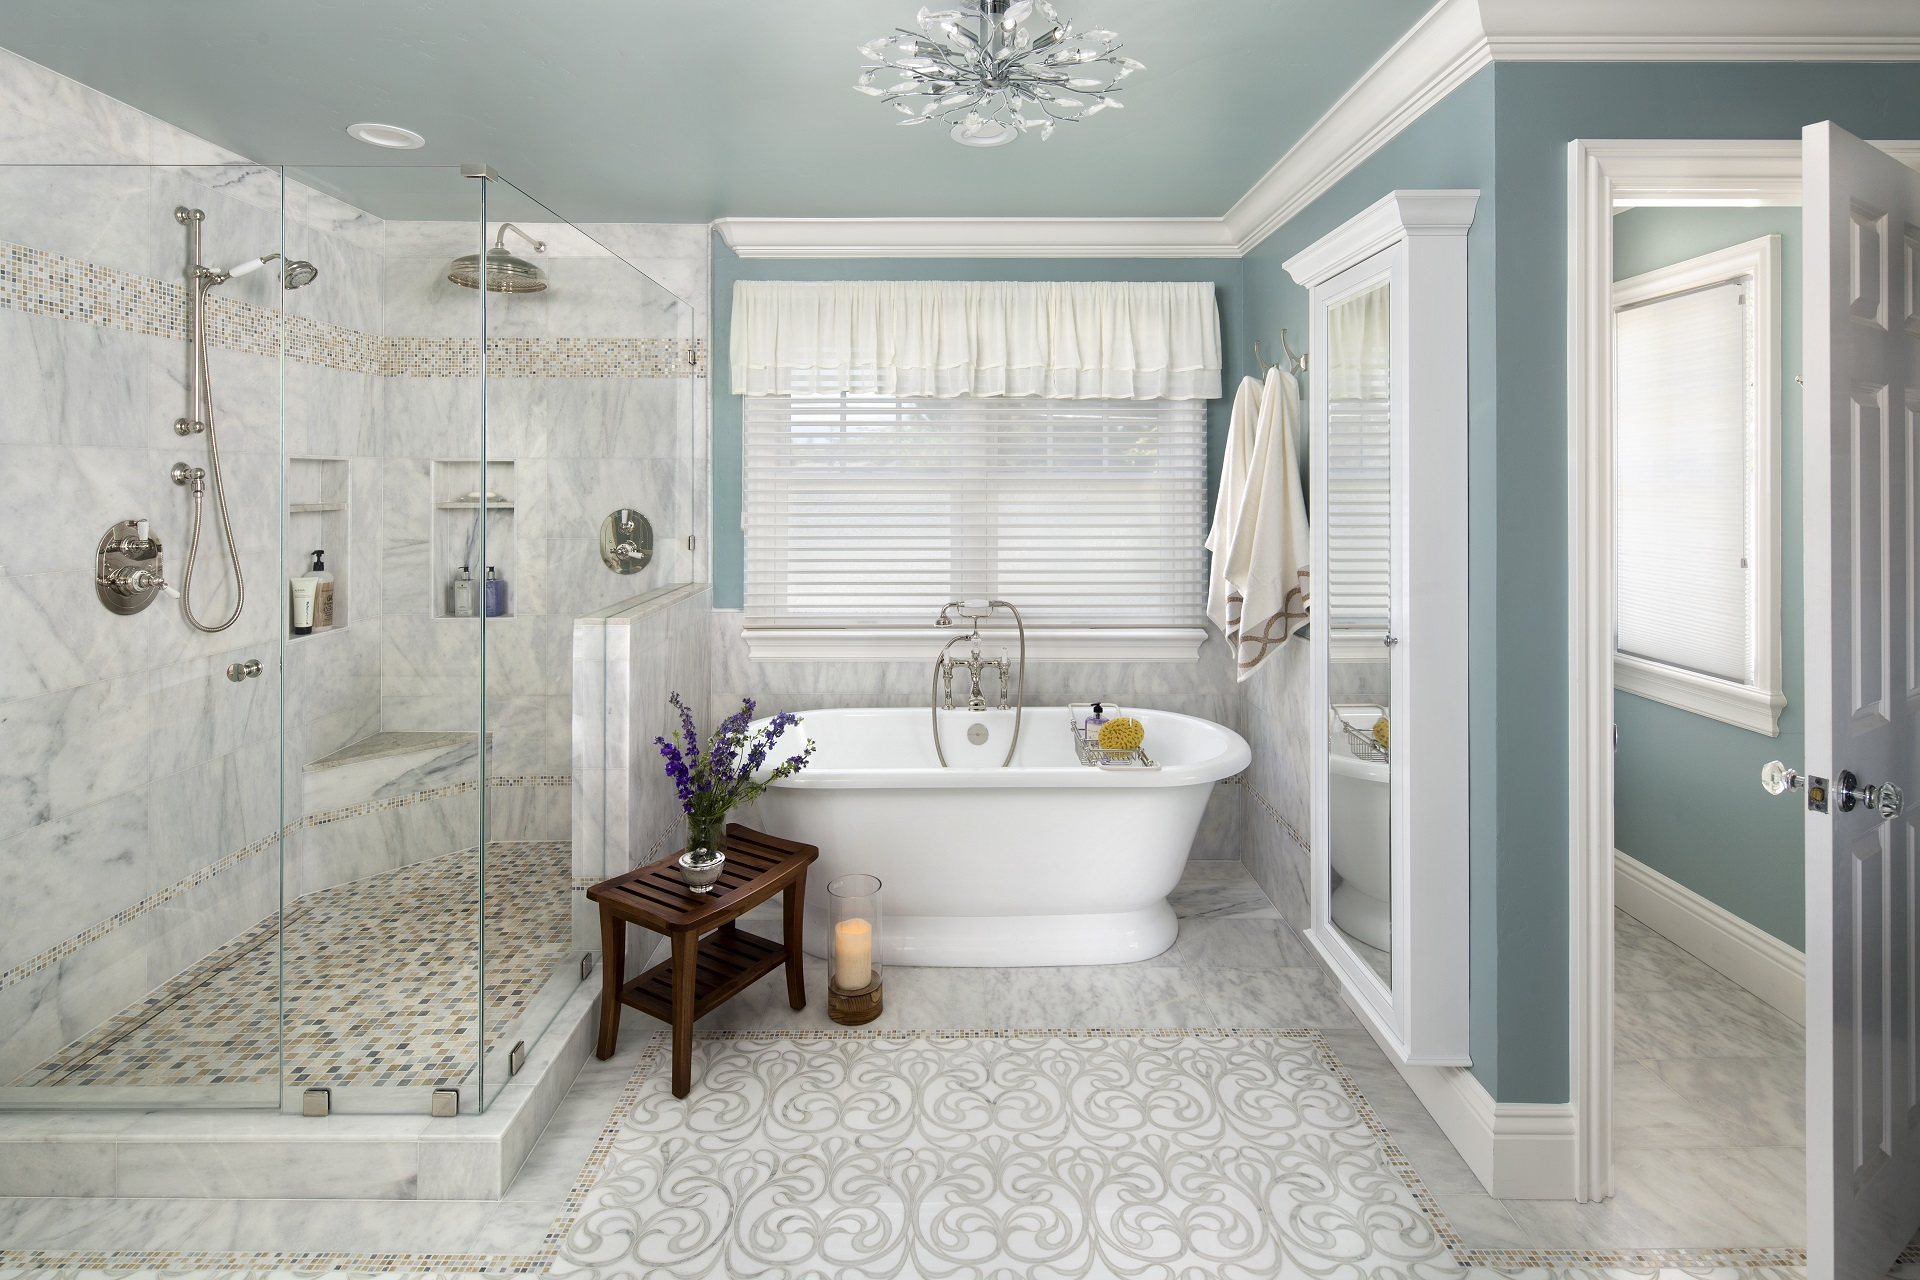 Bathroom Remodeling Portfolio - Valley Home Builders on Master Bathroom Remodel Ideas  id=45594